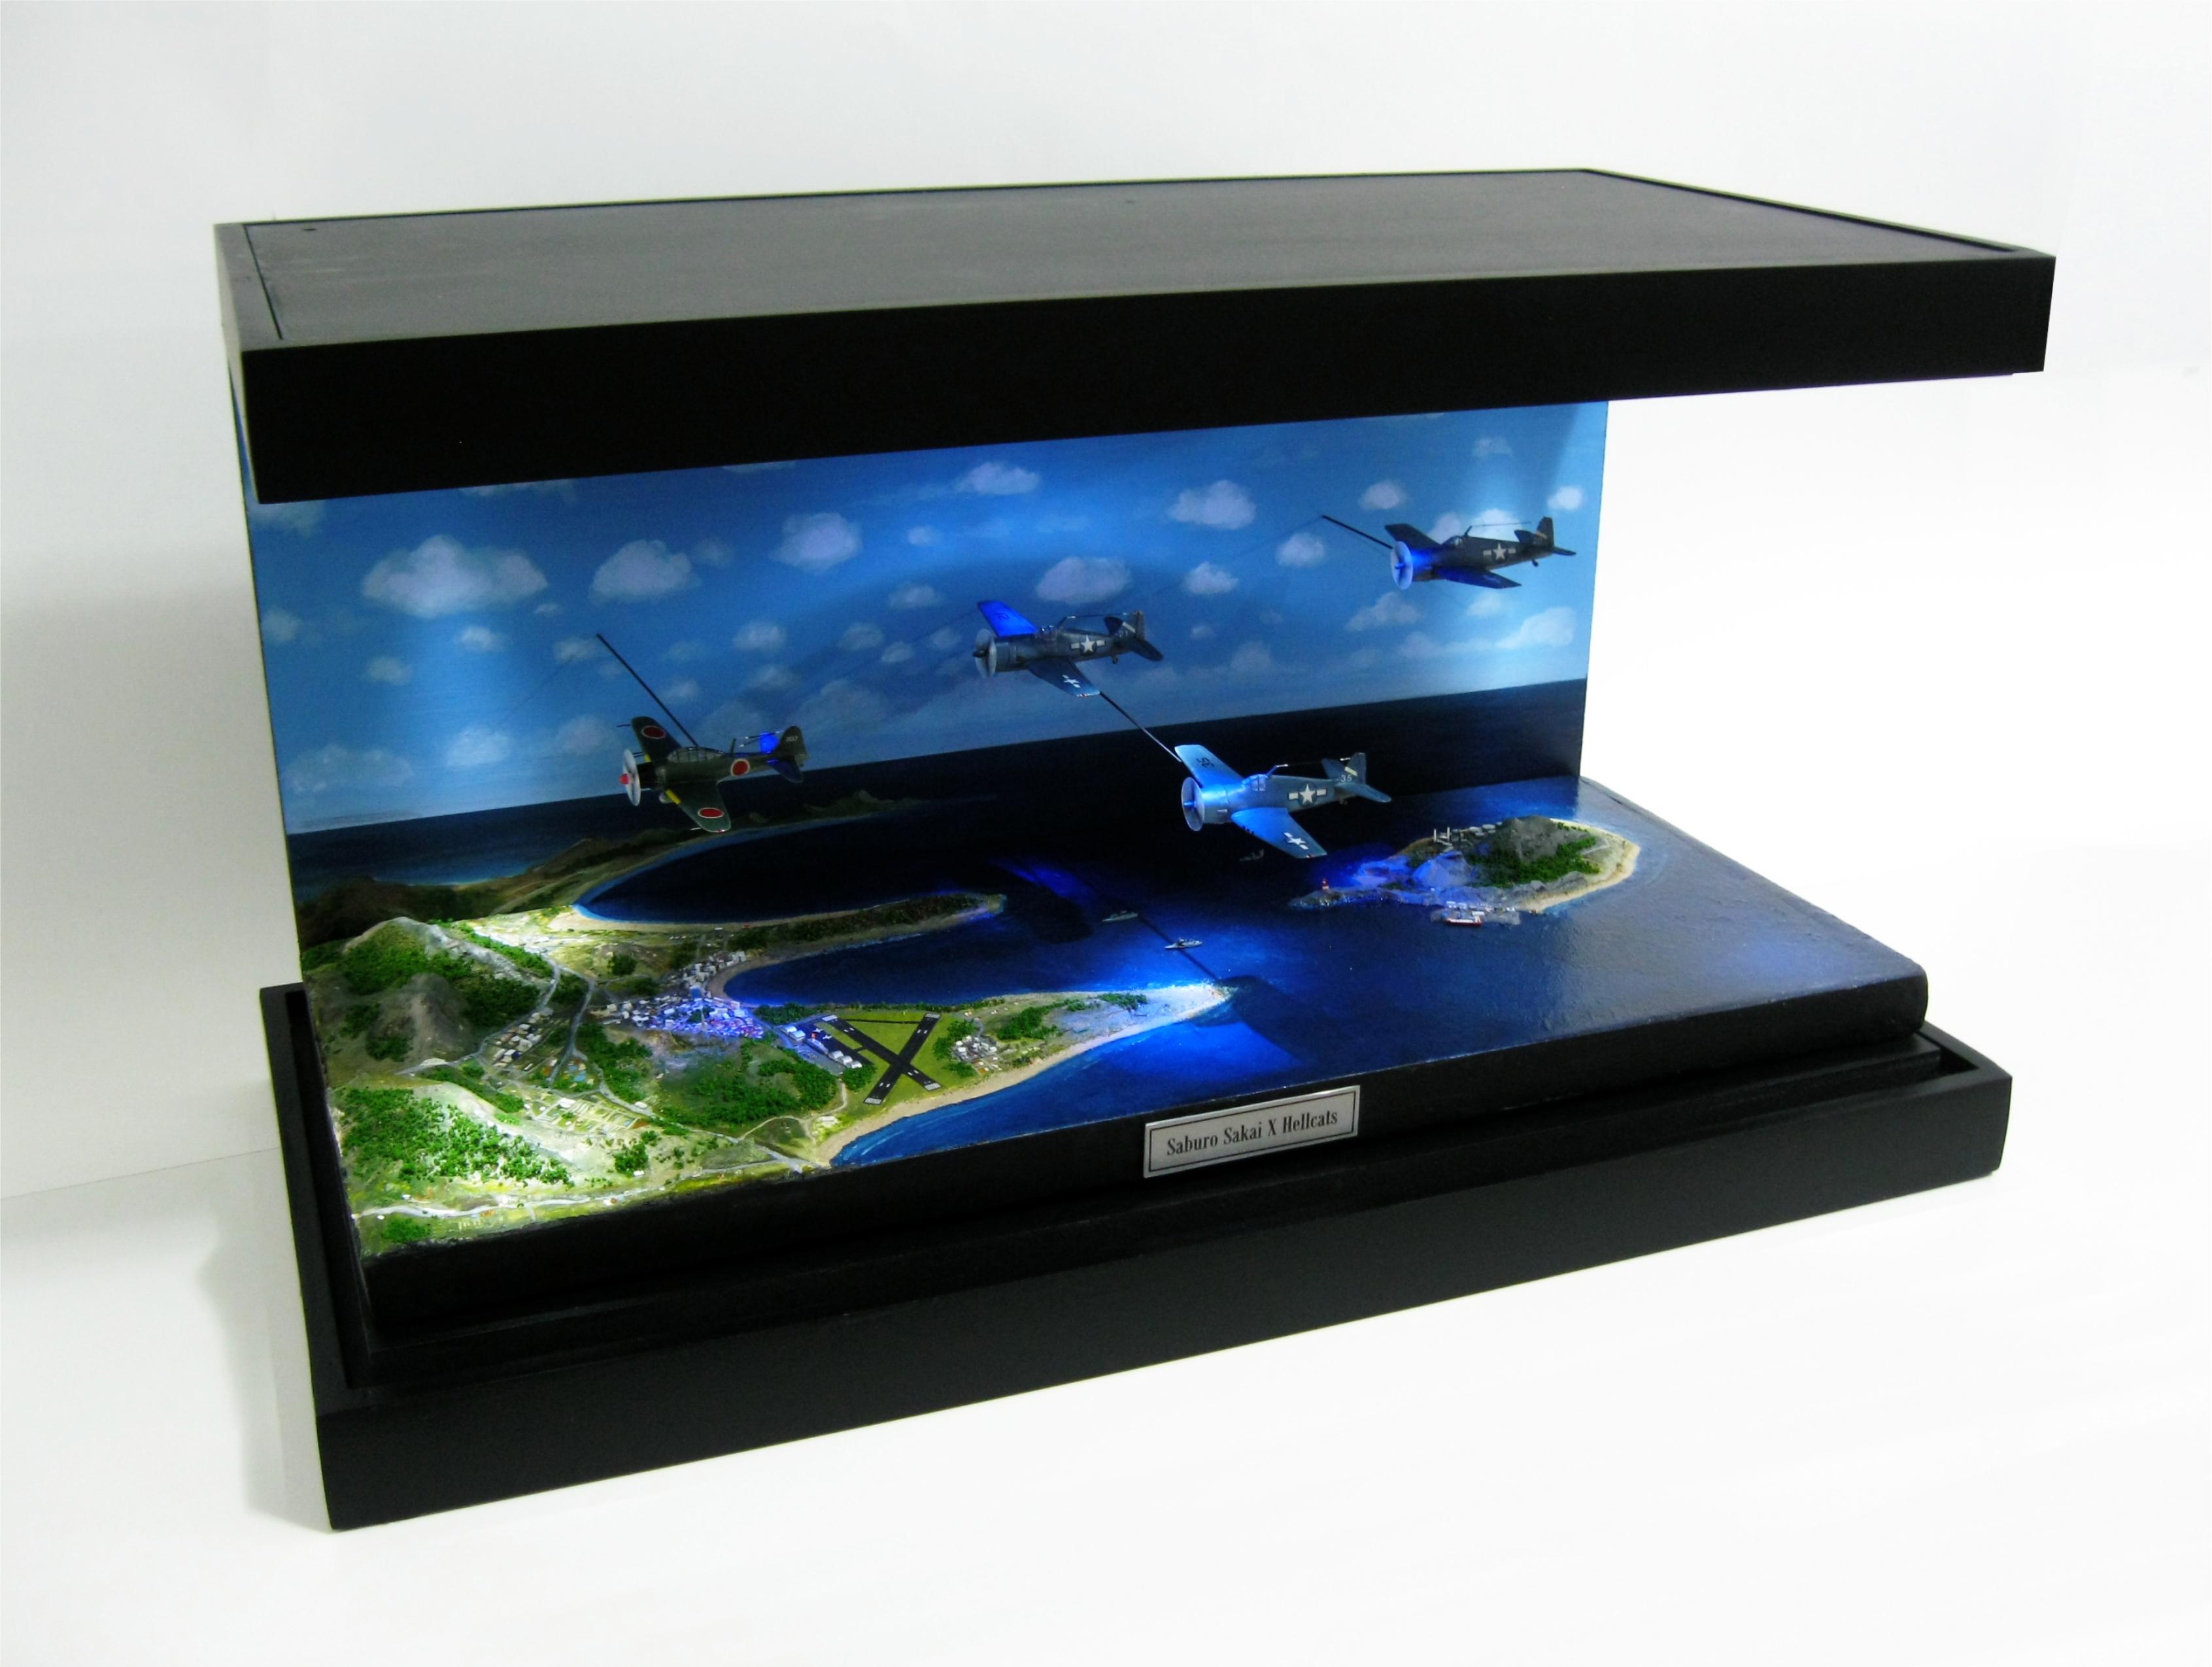 Saburo Sakai diorama